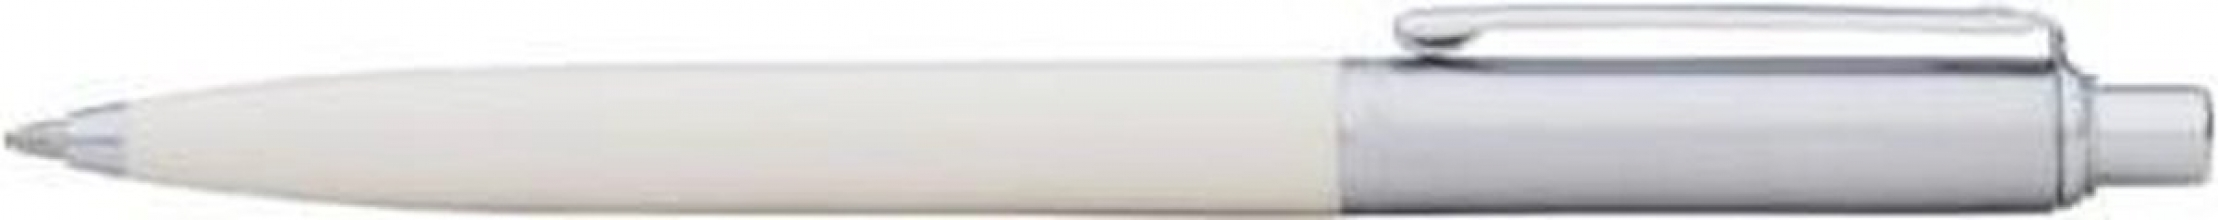 E23210751 , S4 sheaffer sentinel balpen wi/tzilver